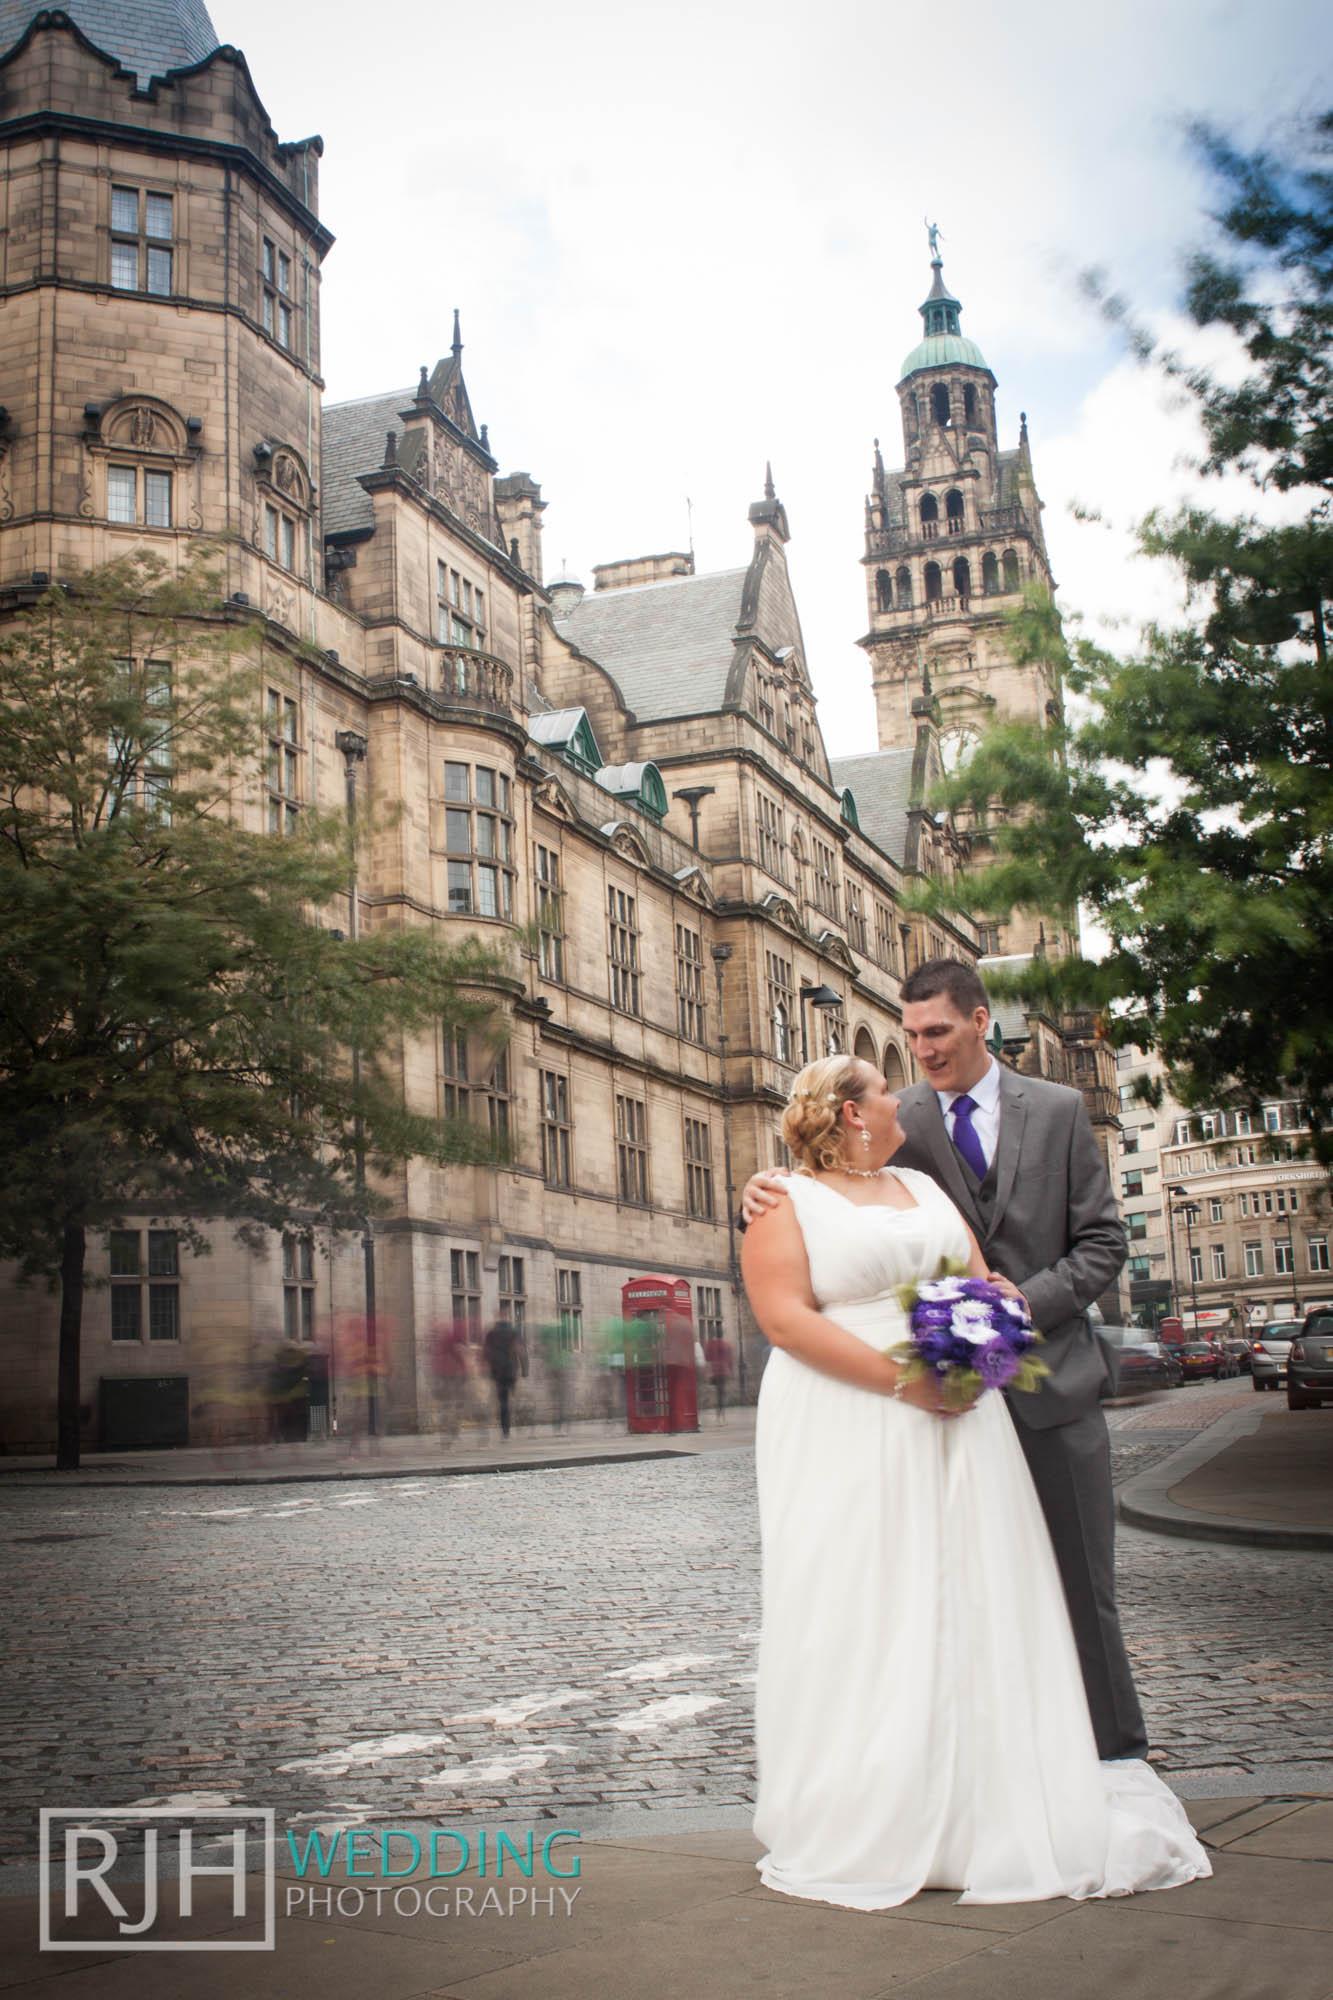 RJH Wedding Photography_2014 highlights_30.jpg